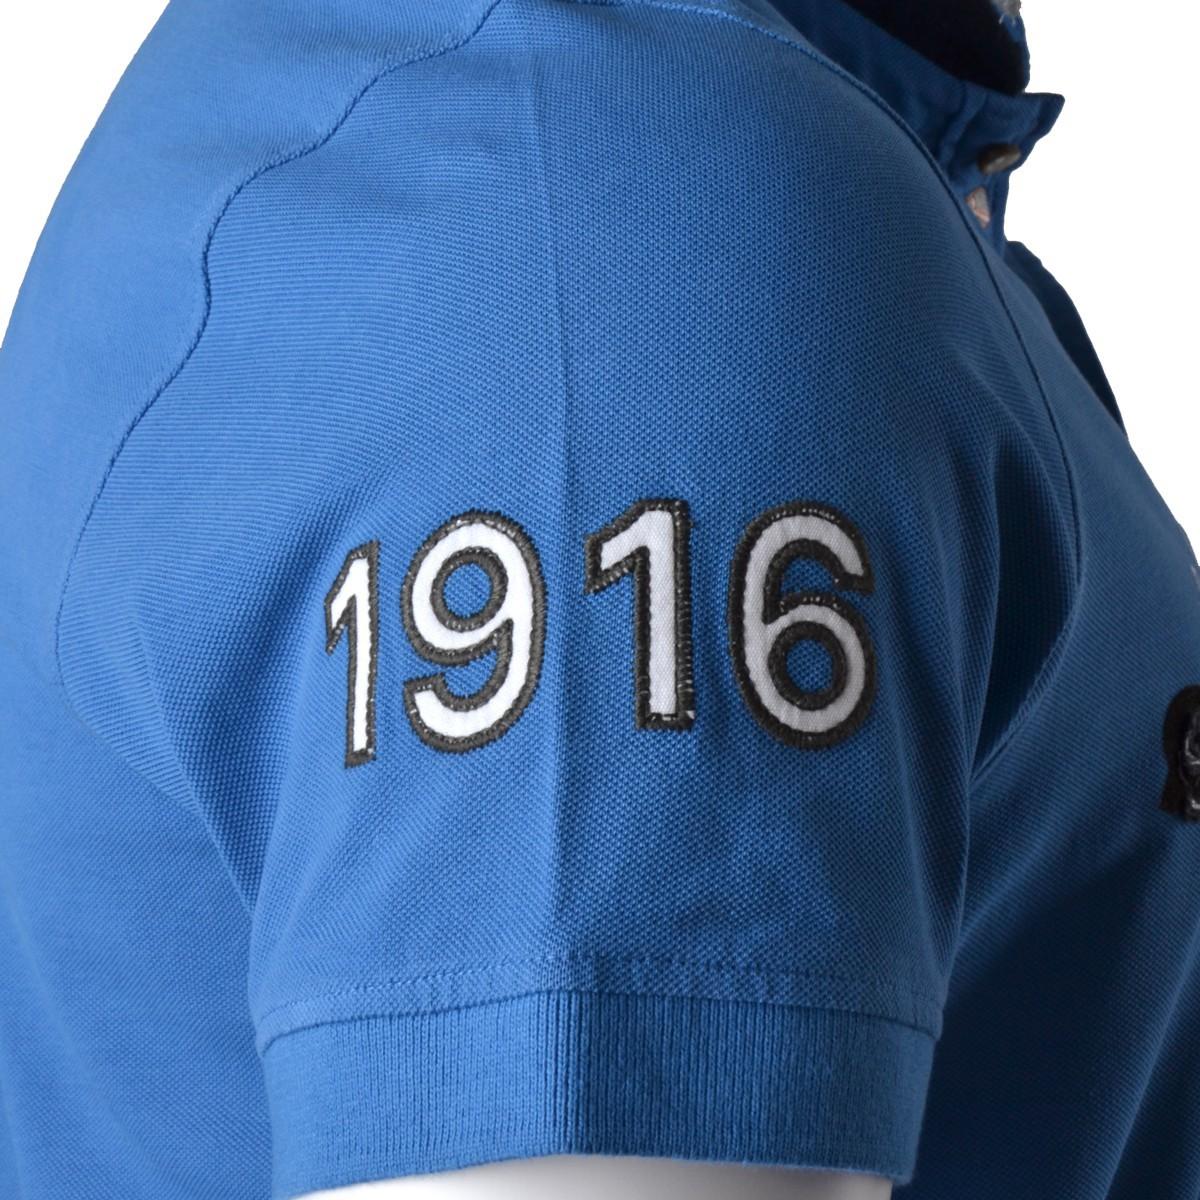 XXL First B Piqué Poloshirt royal blau – Bild 2